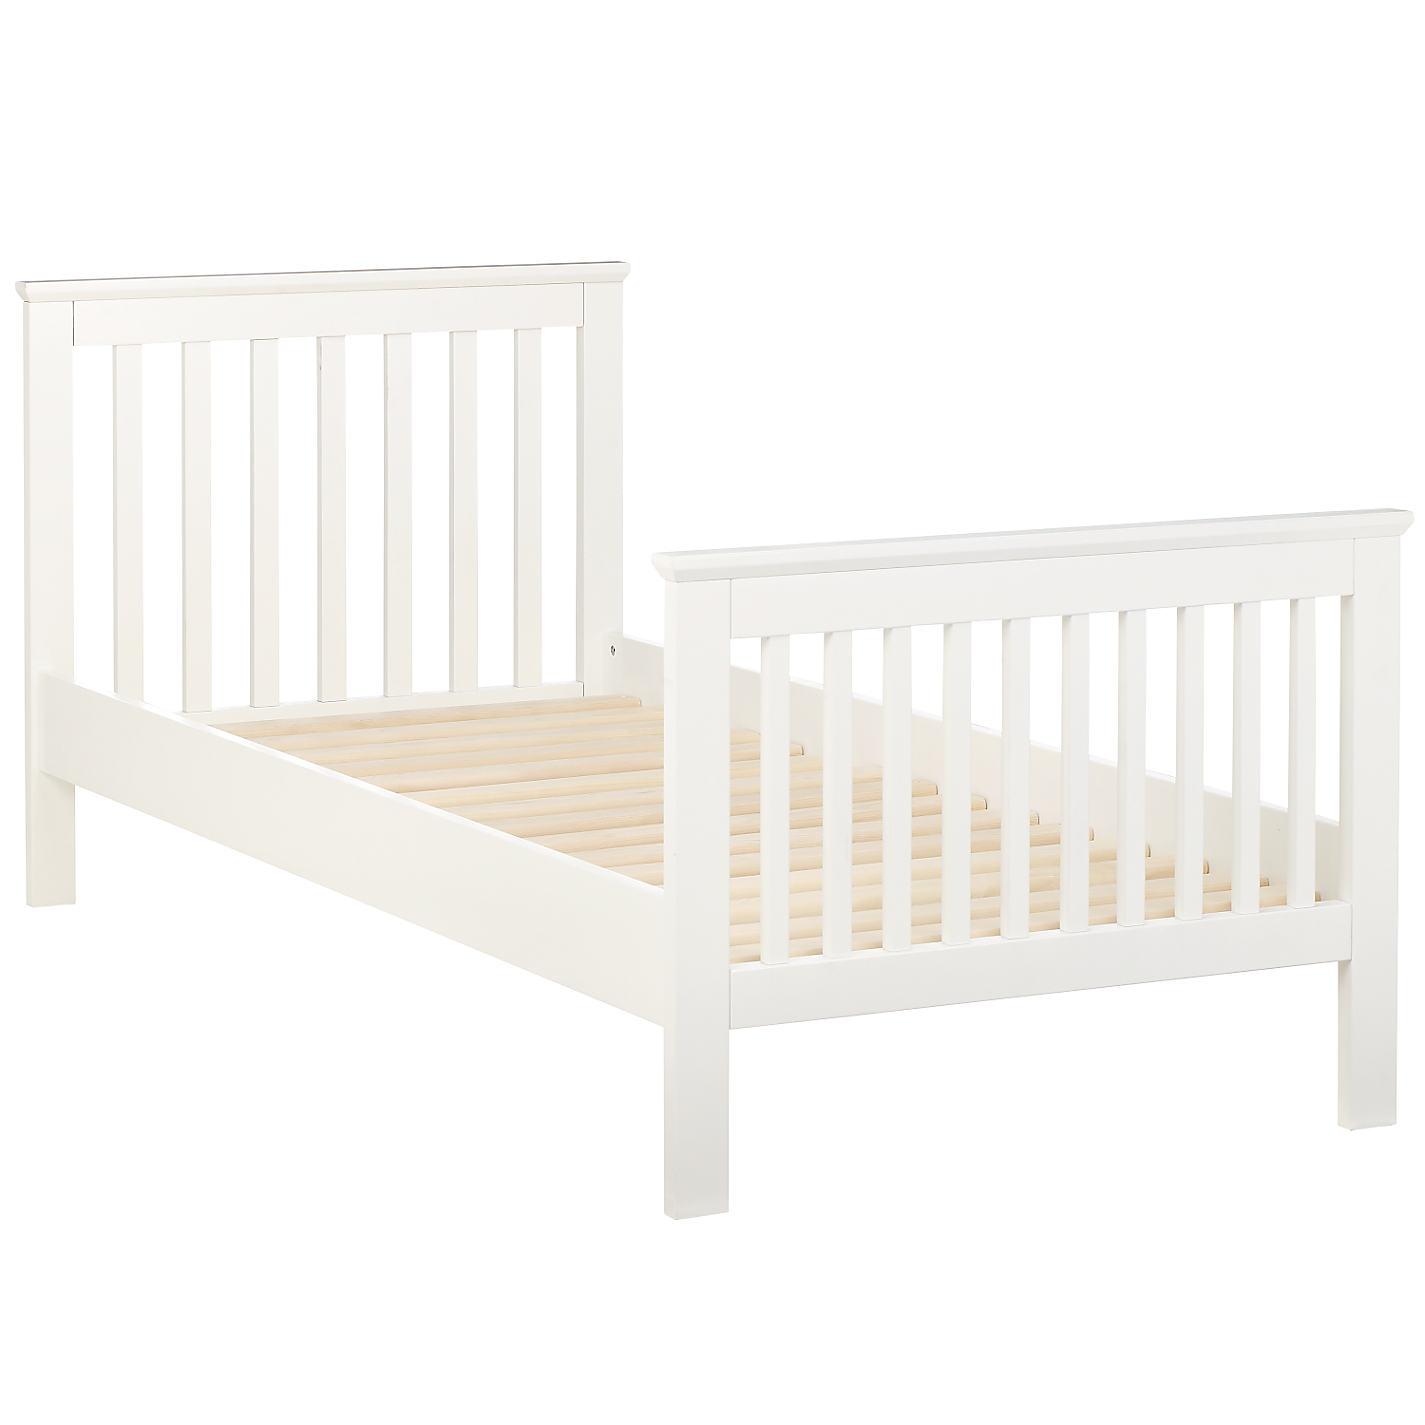 John lewis childrens bedroom furniture - John Lewis Childrens Bedroom Furniture